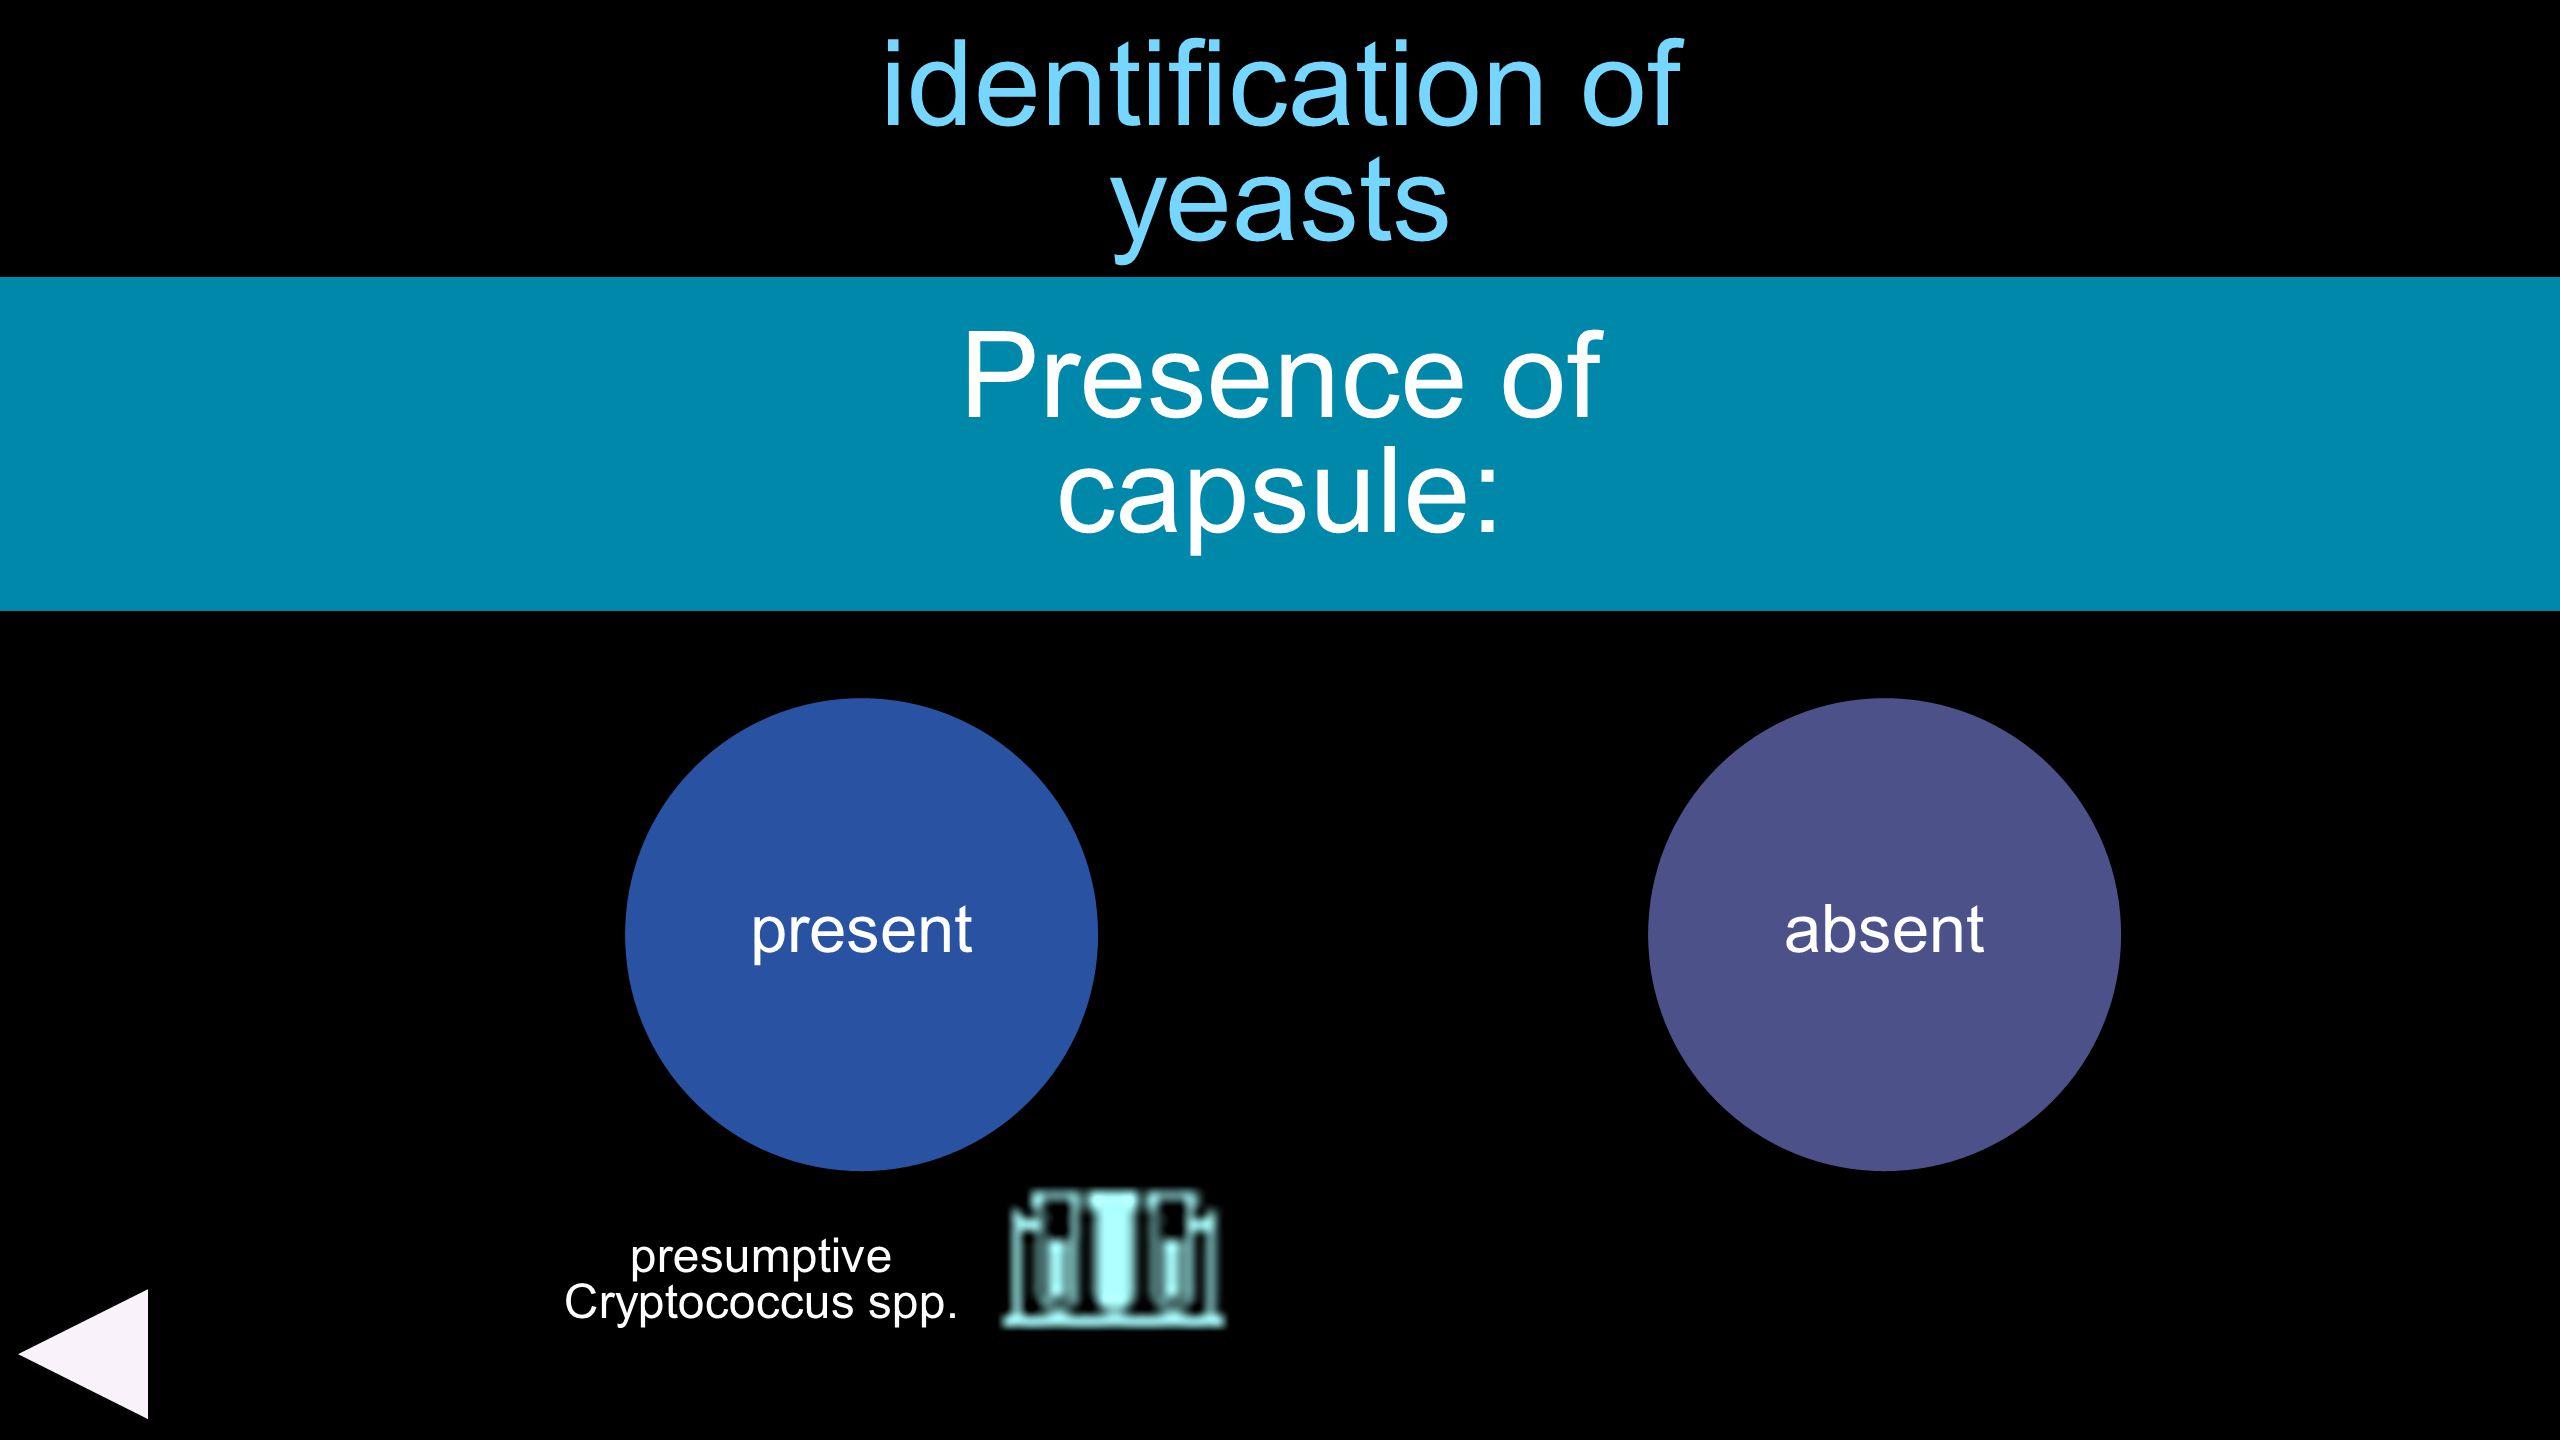 identification of yeasts Presence of capsule: presentabsent presumptive Cryptococcus spp.